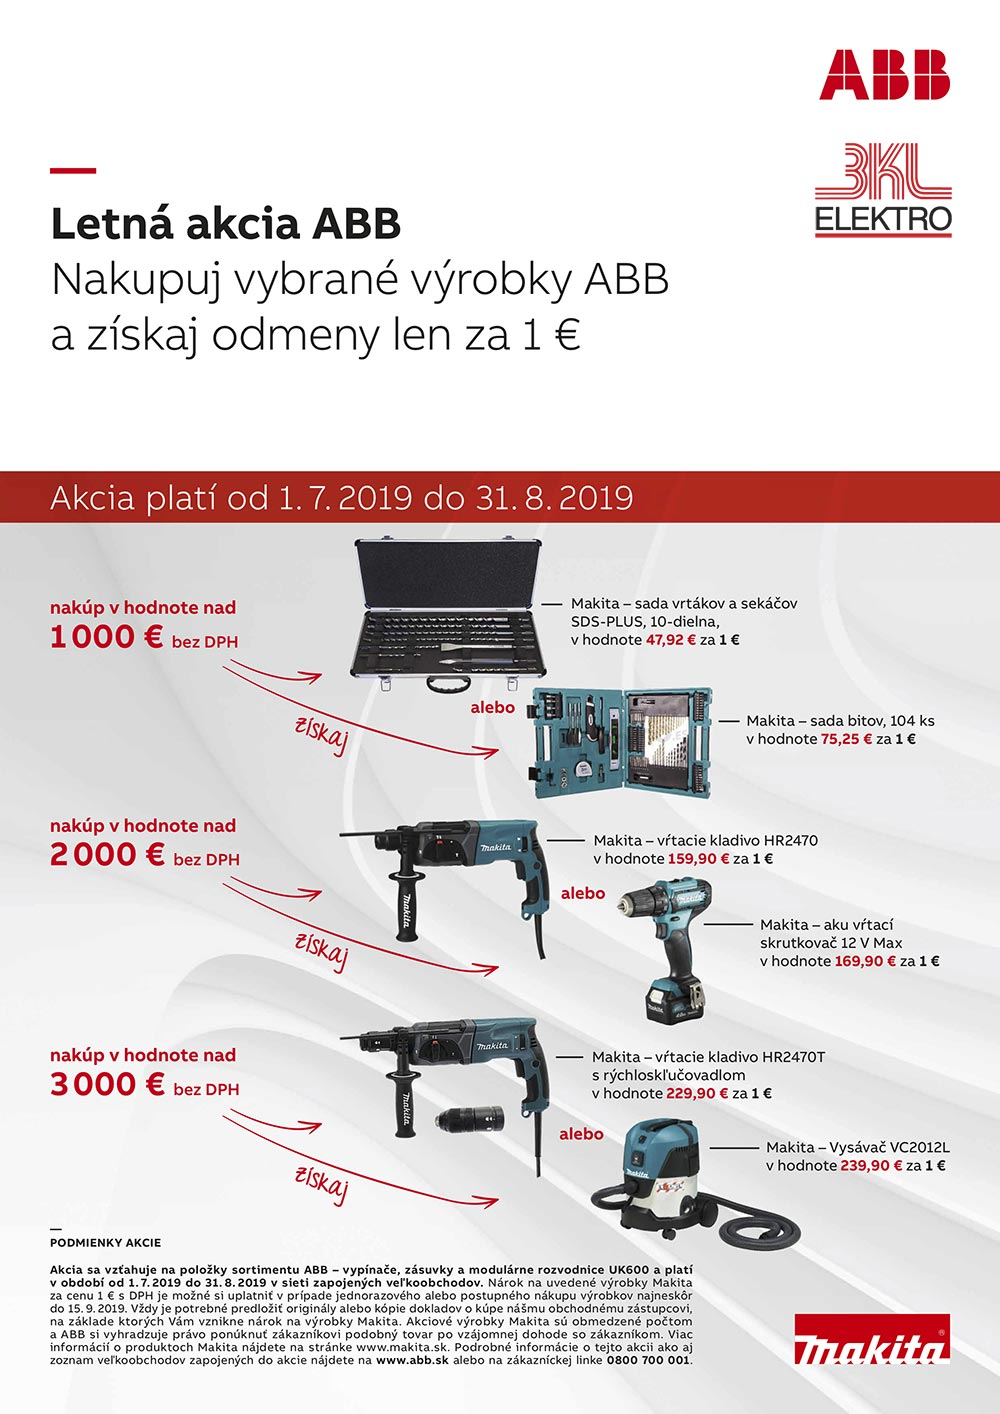 BKL ELEKTRO - Letná akcia ABB 2019